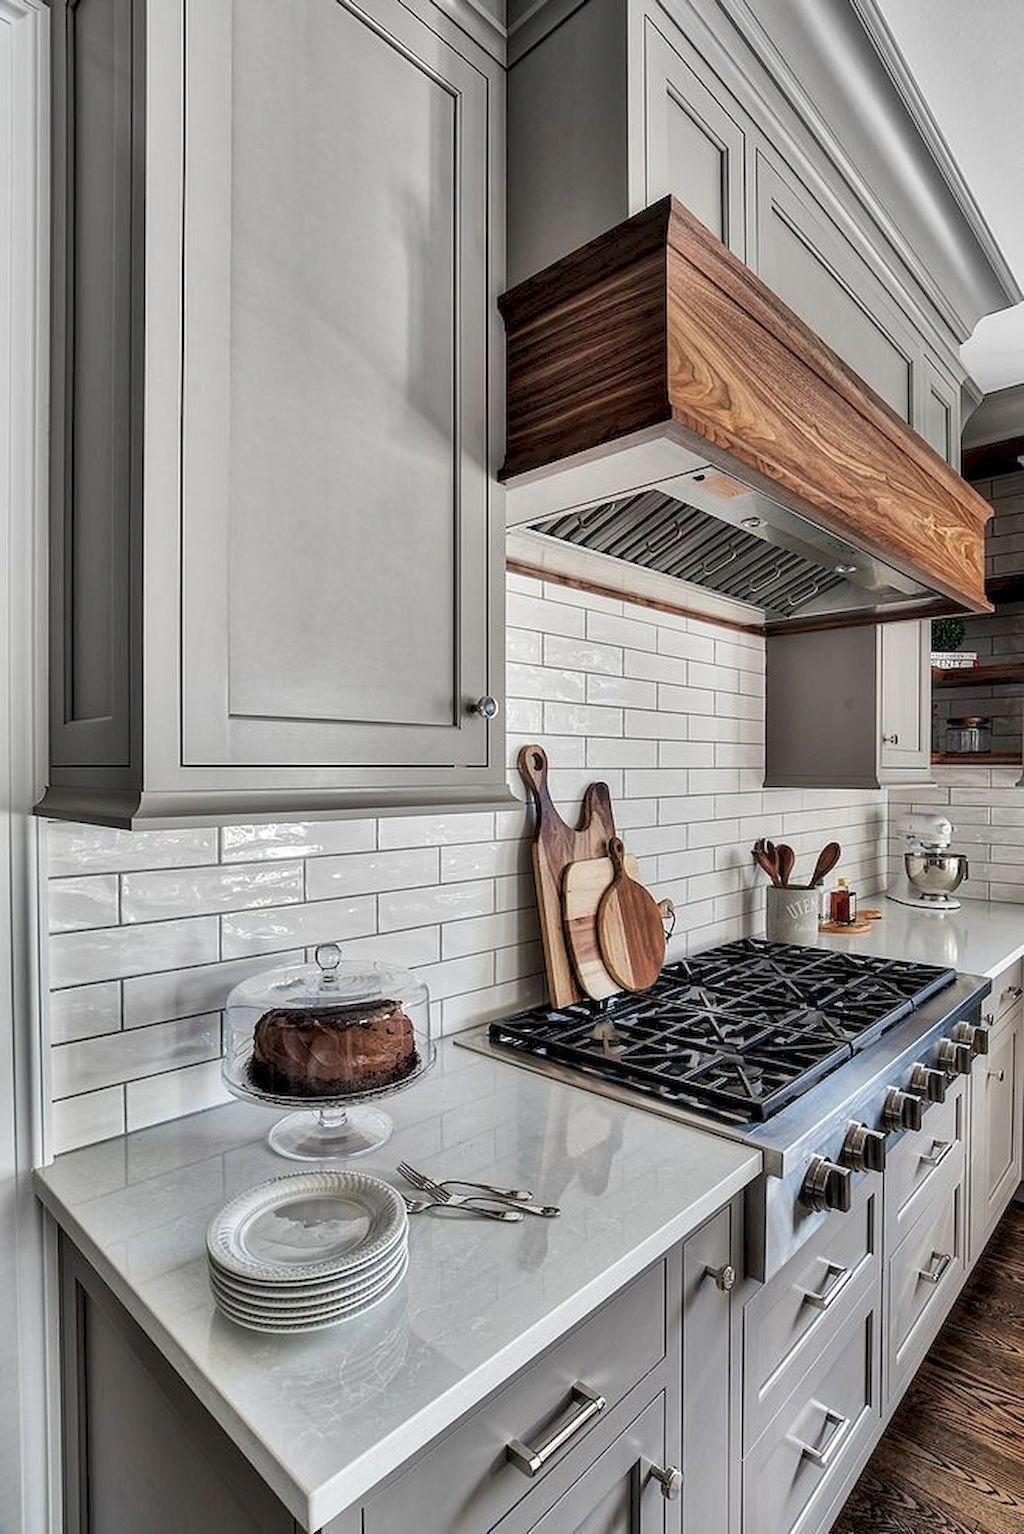 - 35+ Trendiest Kitchen Backplash Ideas To Inspire You - Sooziq.com